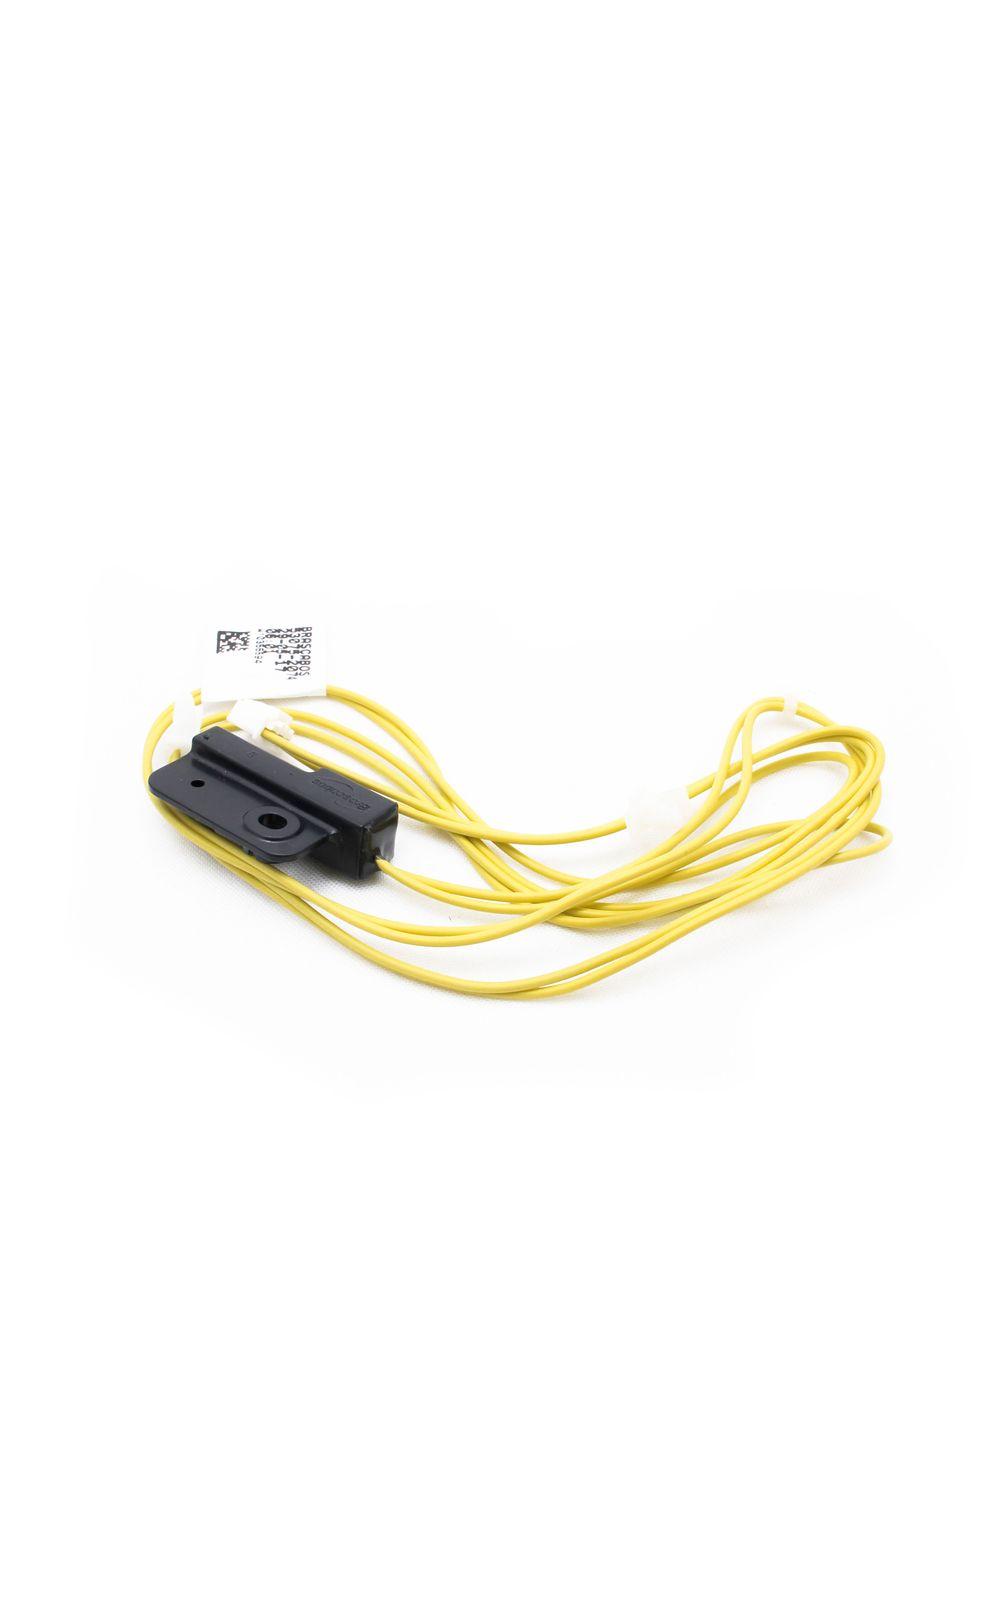 Foto 3 - Microchave Reed Switch Brastemp